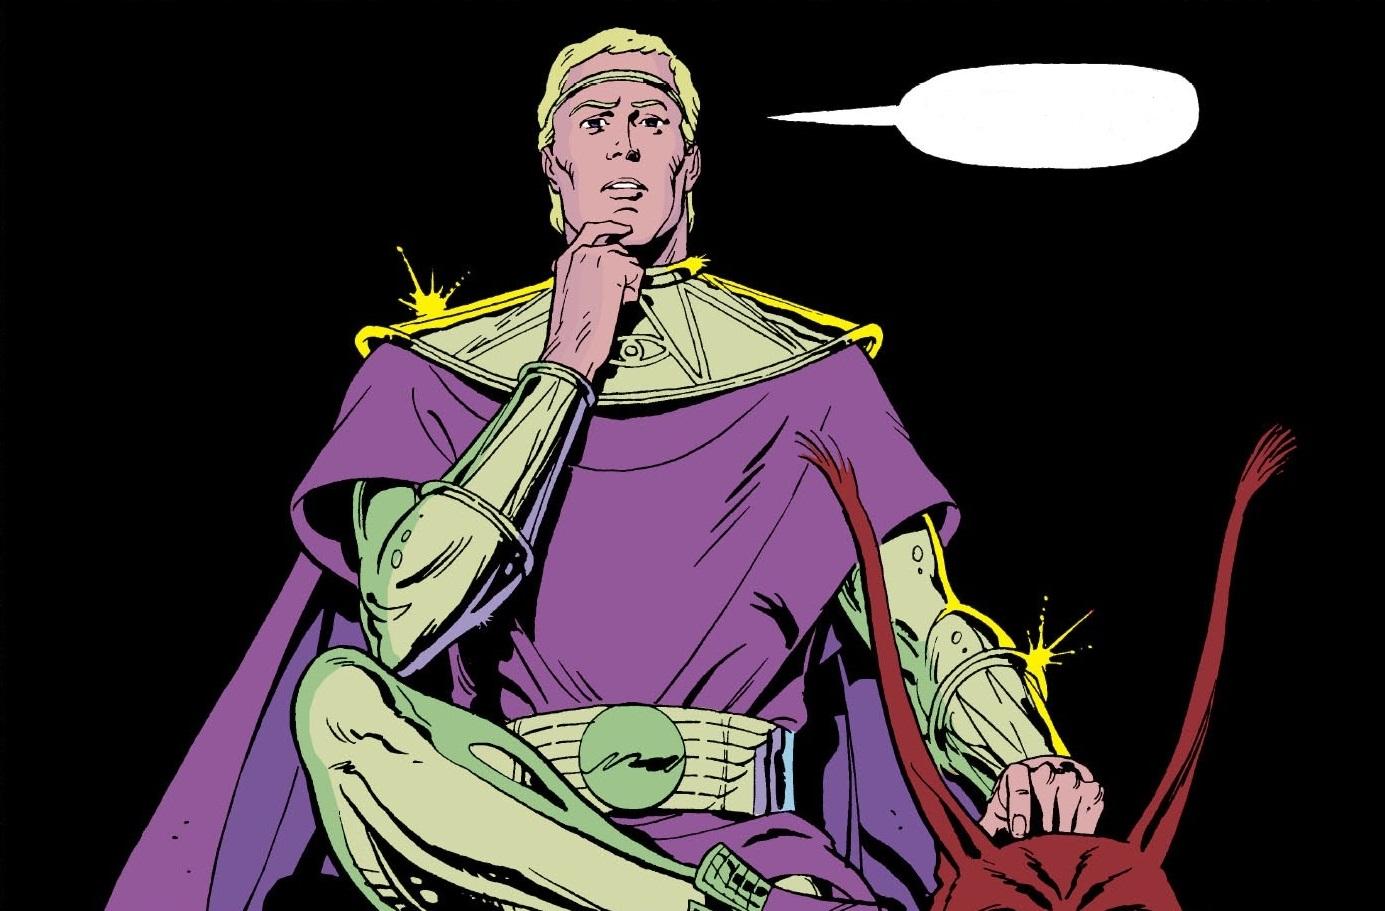 Adrian Veidt - Watchmen Wiki - the graphic novel and movie database